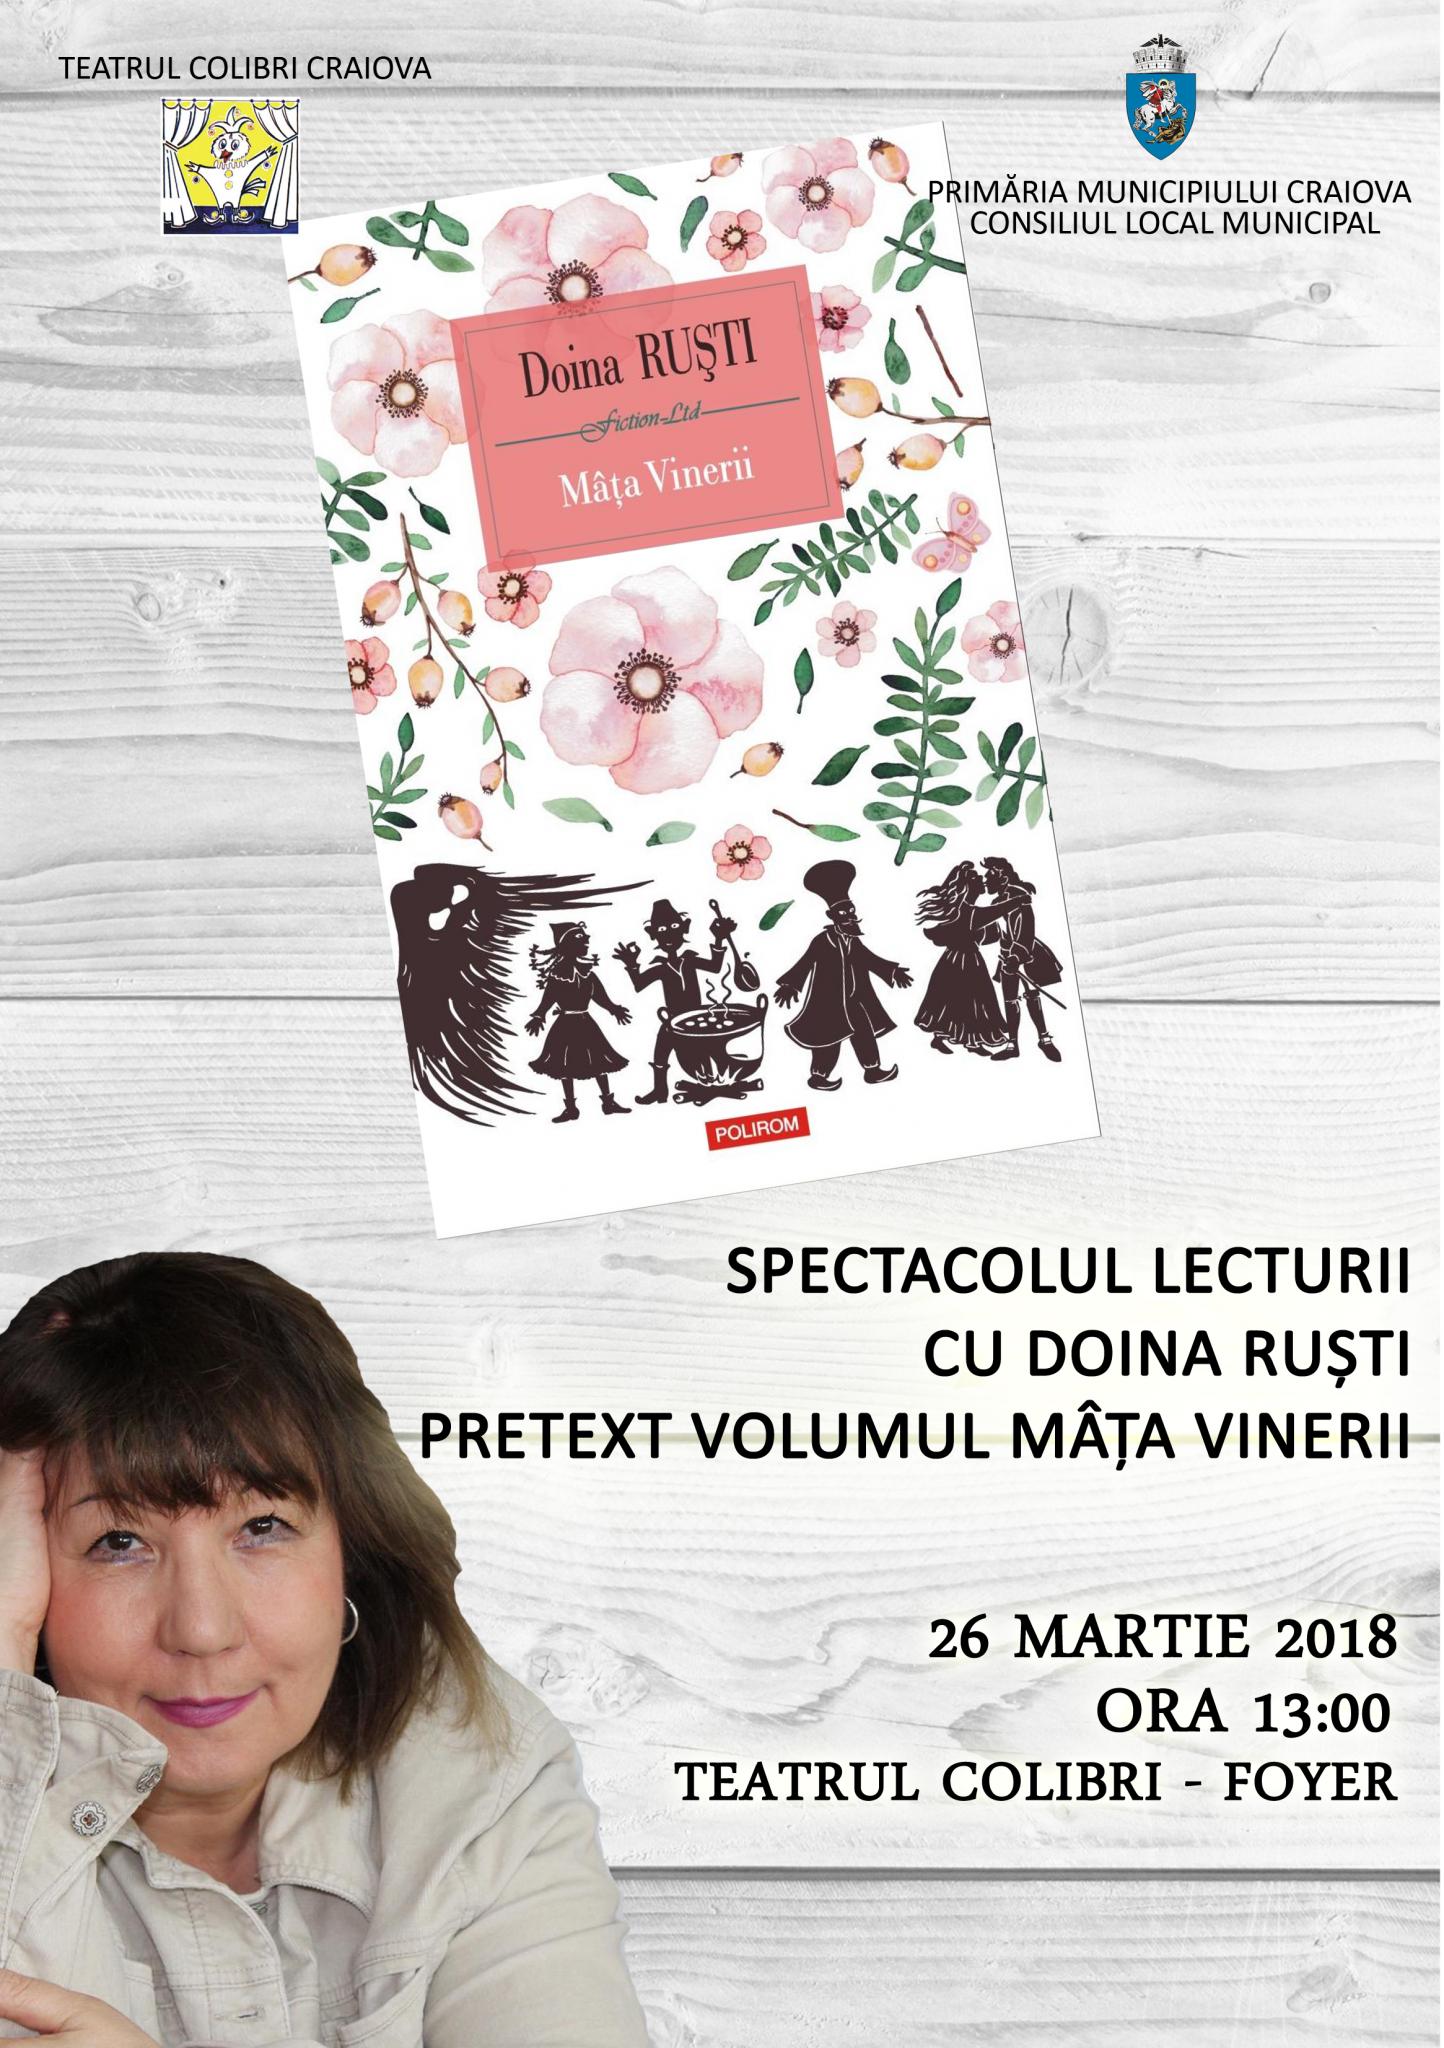 Teatrul Colibri: Spectacolul lecturii, cu Doina Ruști